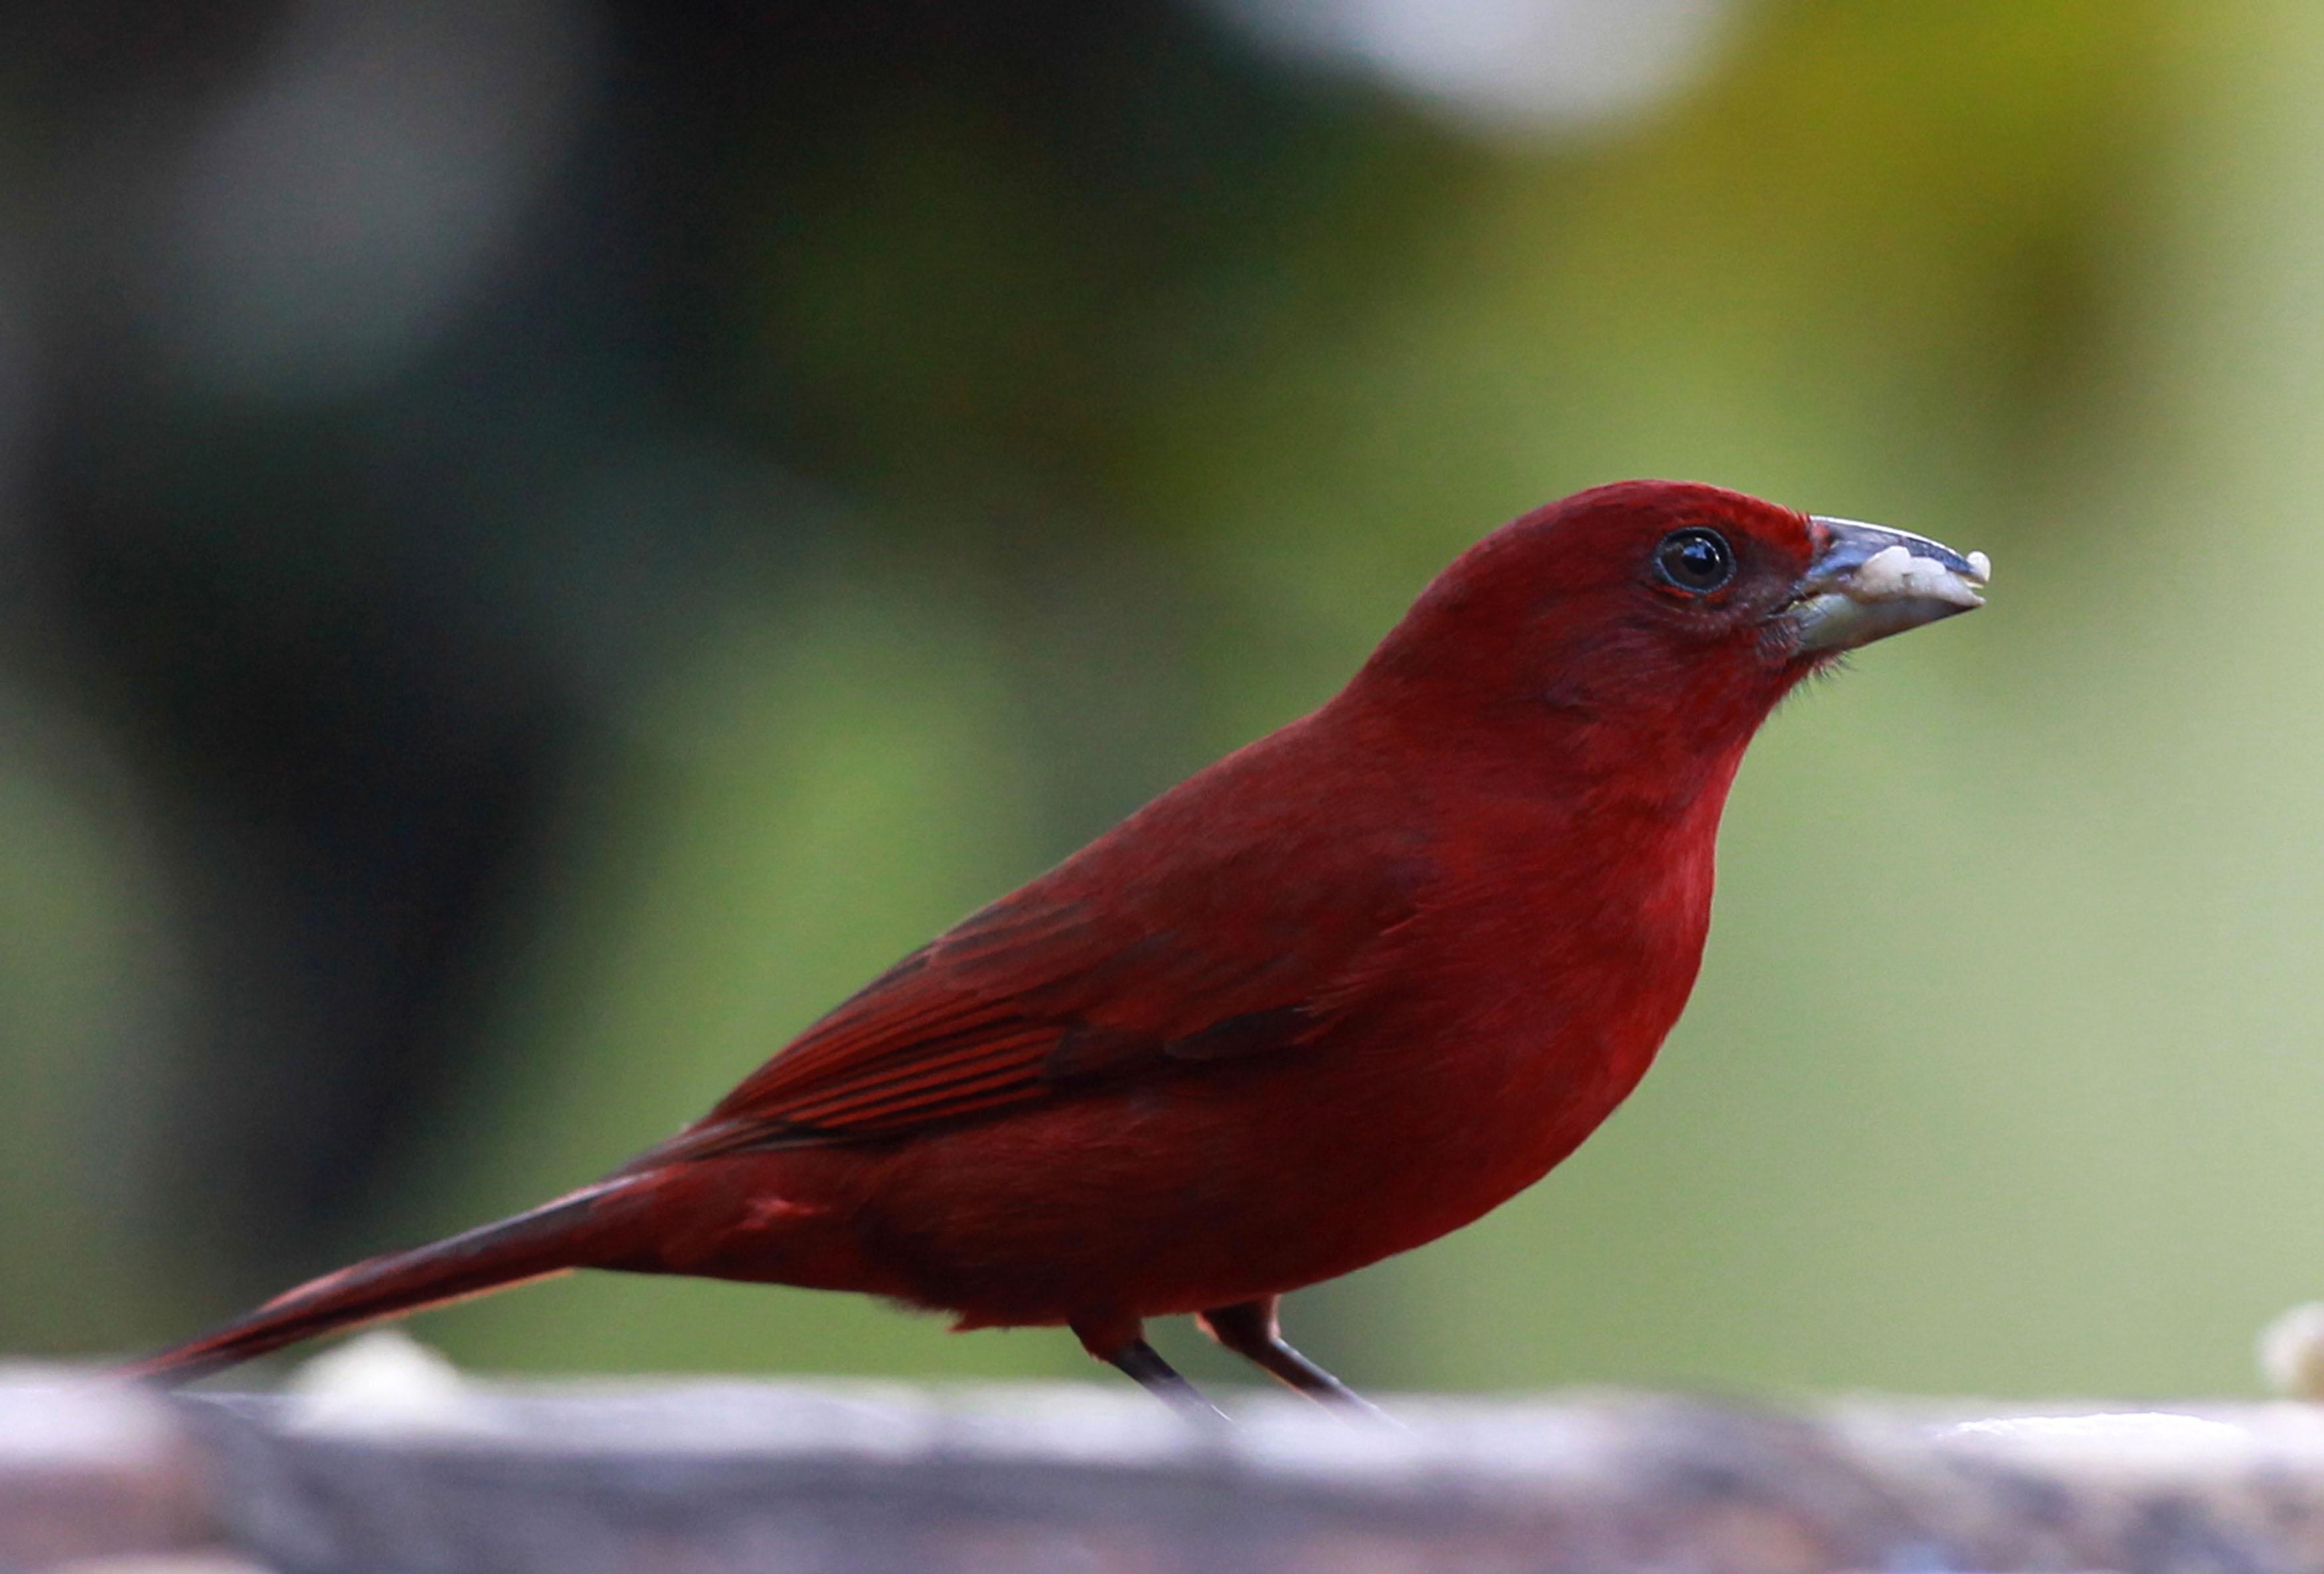 Feria internacional de aves Colombia Birdfair 2018